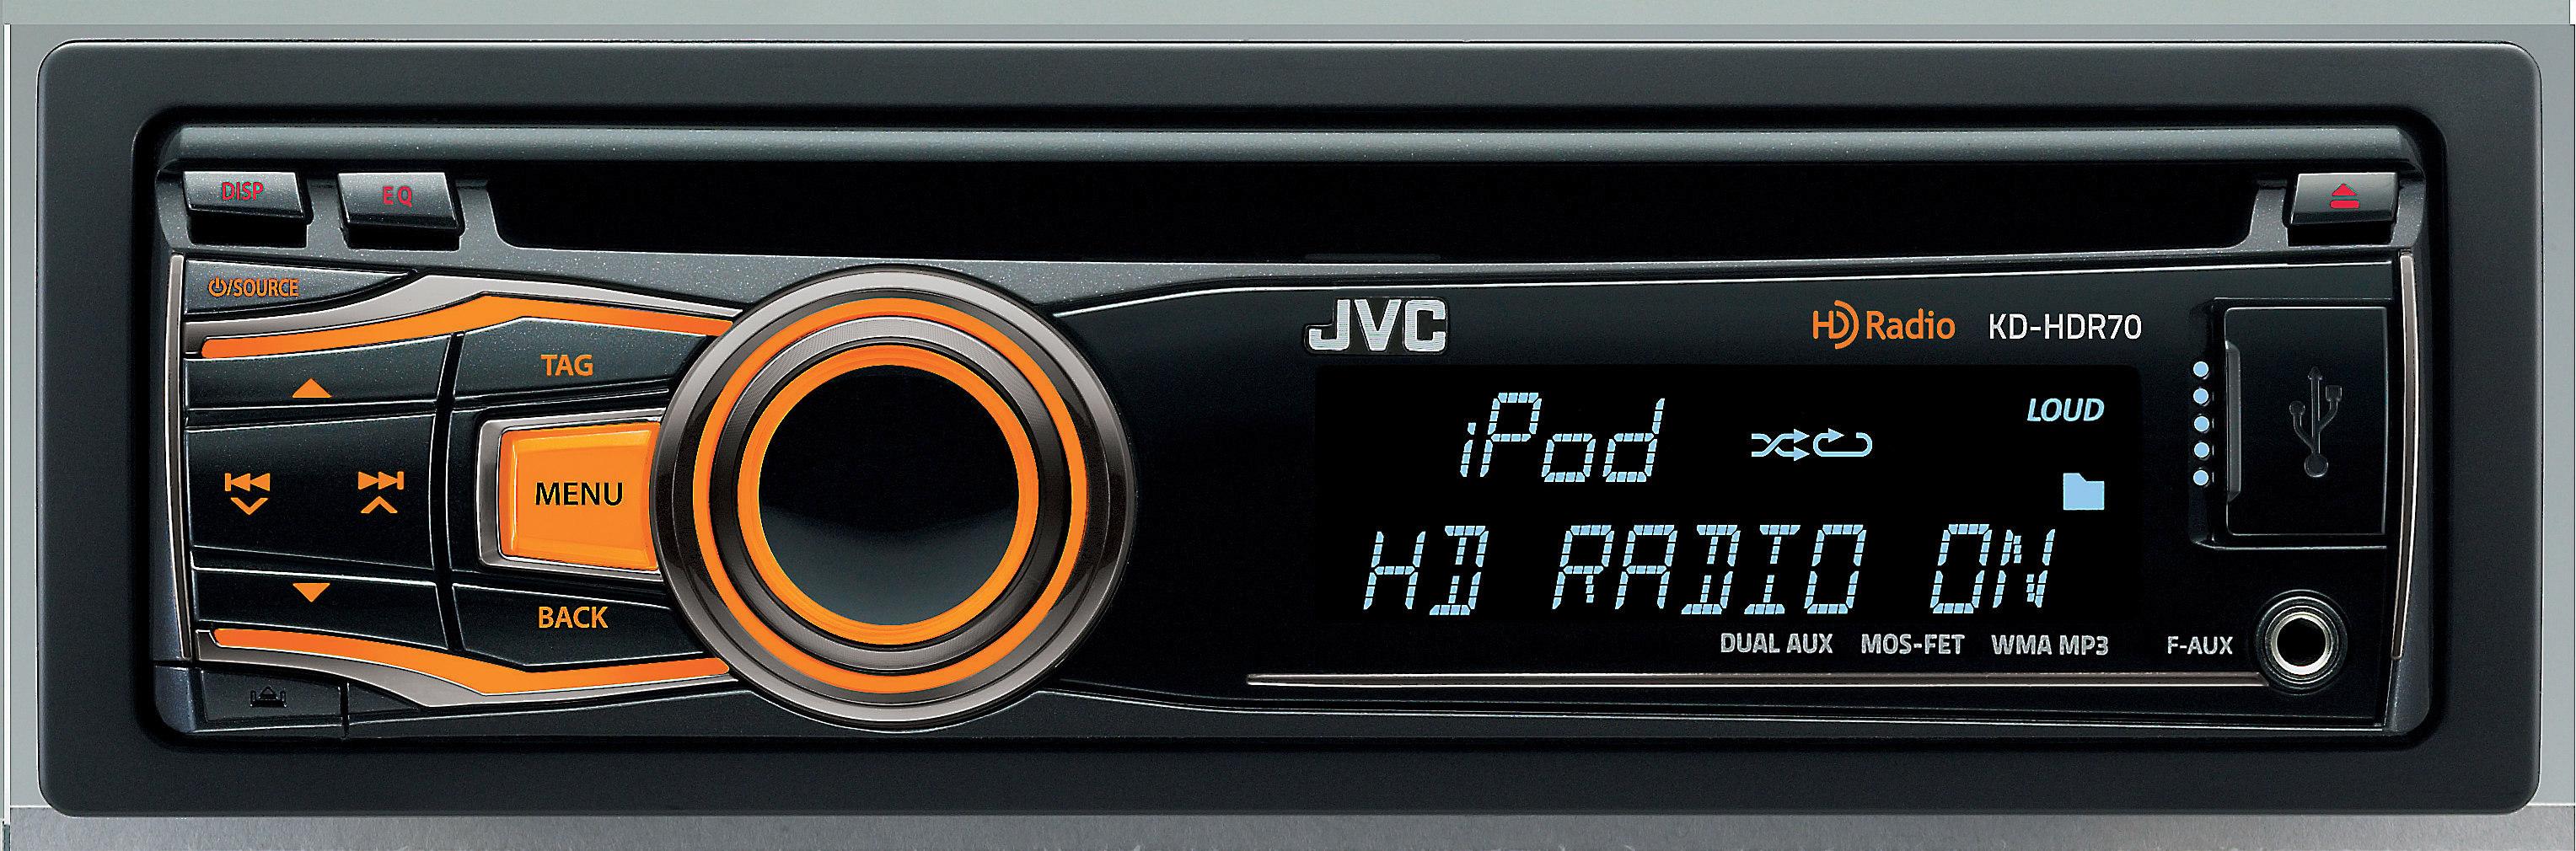 JVC KD-HDR70 CD receiver at Crutchfield on